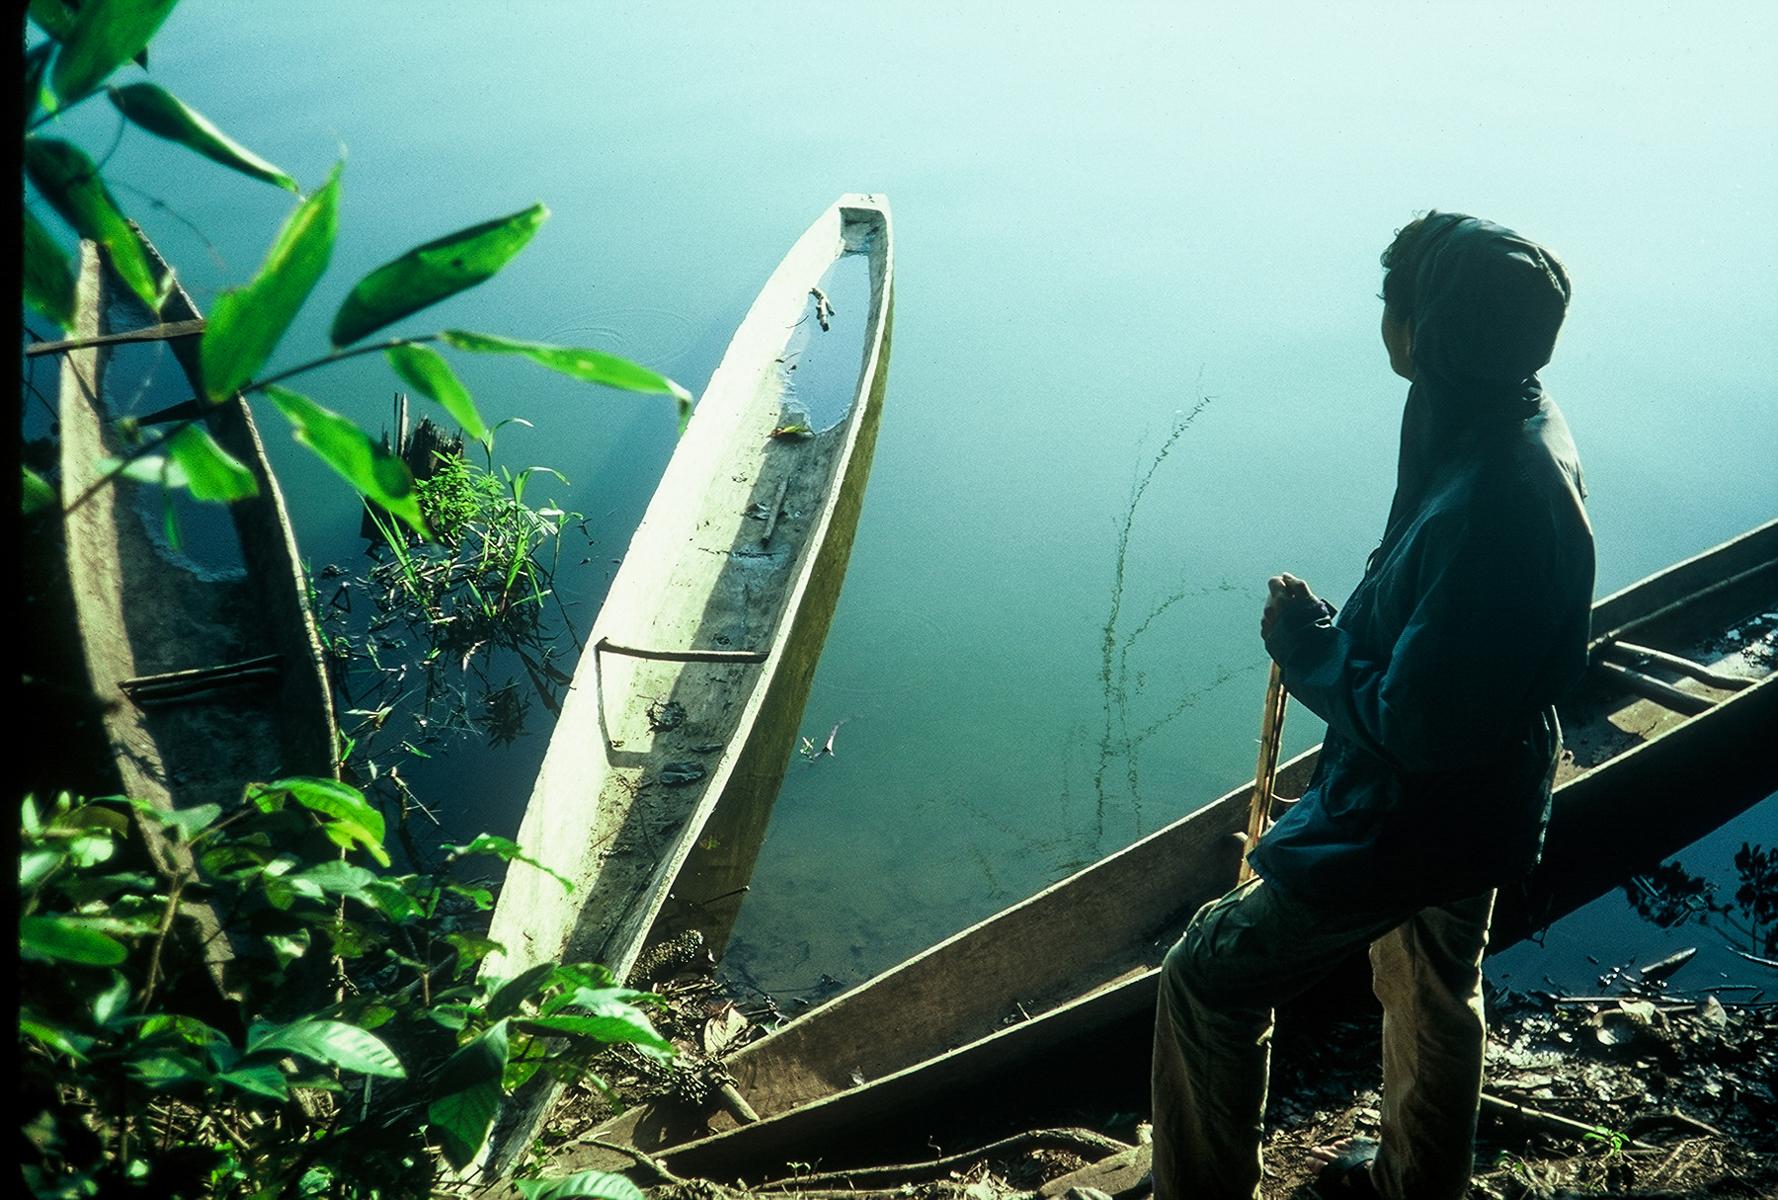 Canoes, Manu, Peru ©1987 Lisa Berman